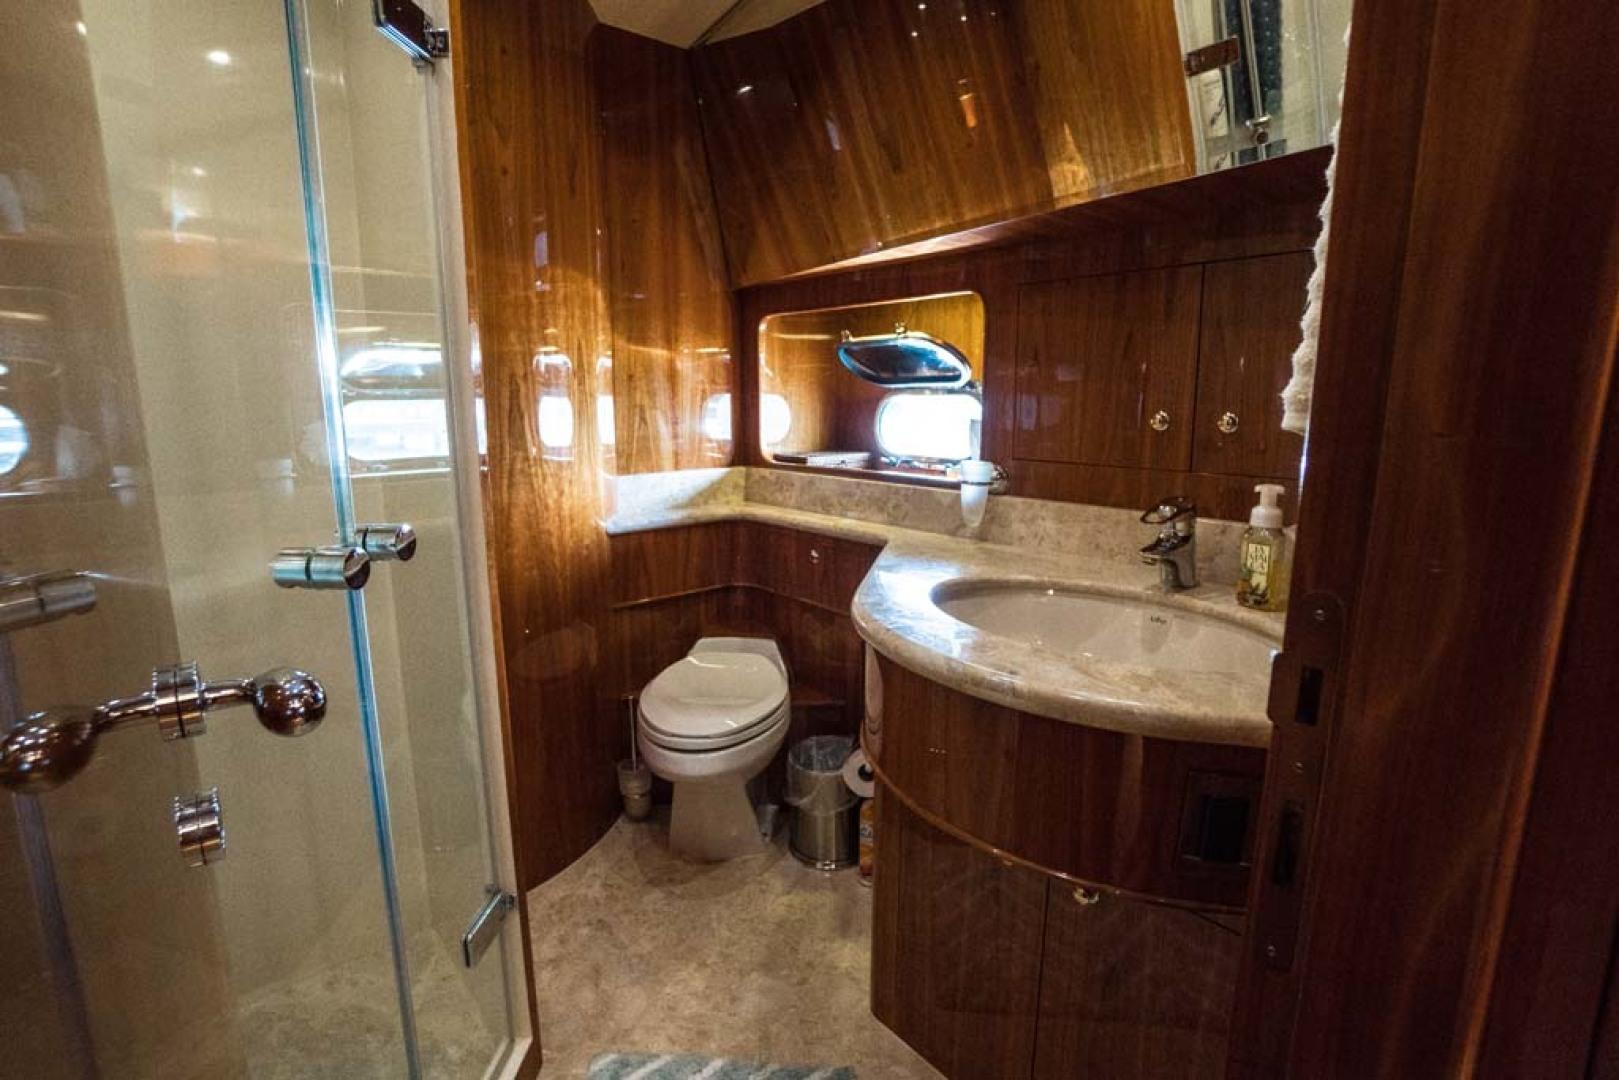 Horizon-Cockpit-Motor-Yacht-2008-Liberation-Stuart-Florida-United-States-VIP-Stateroom-Head-and-Shower-1075357